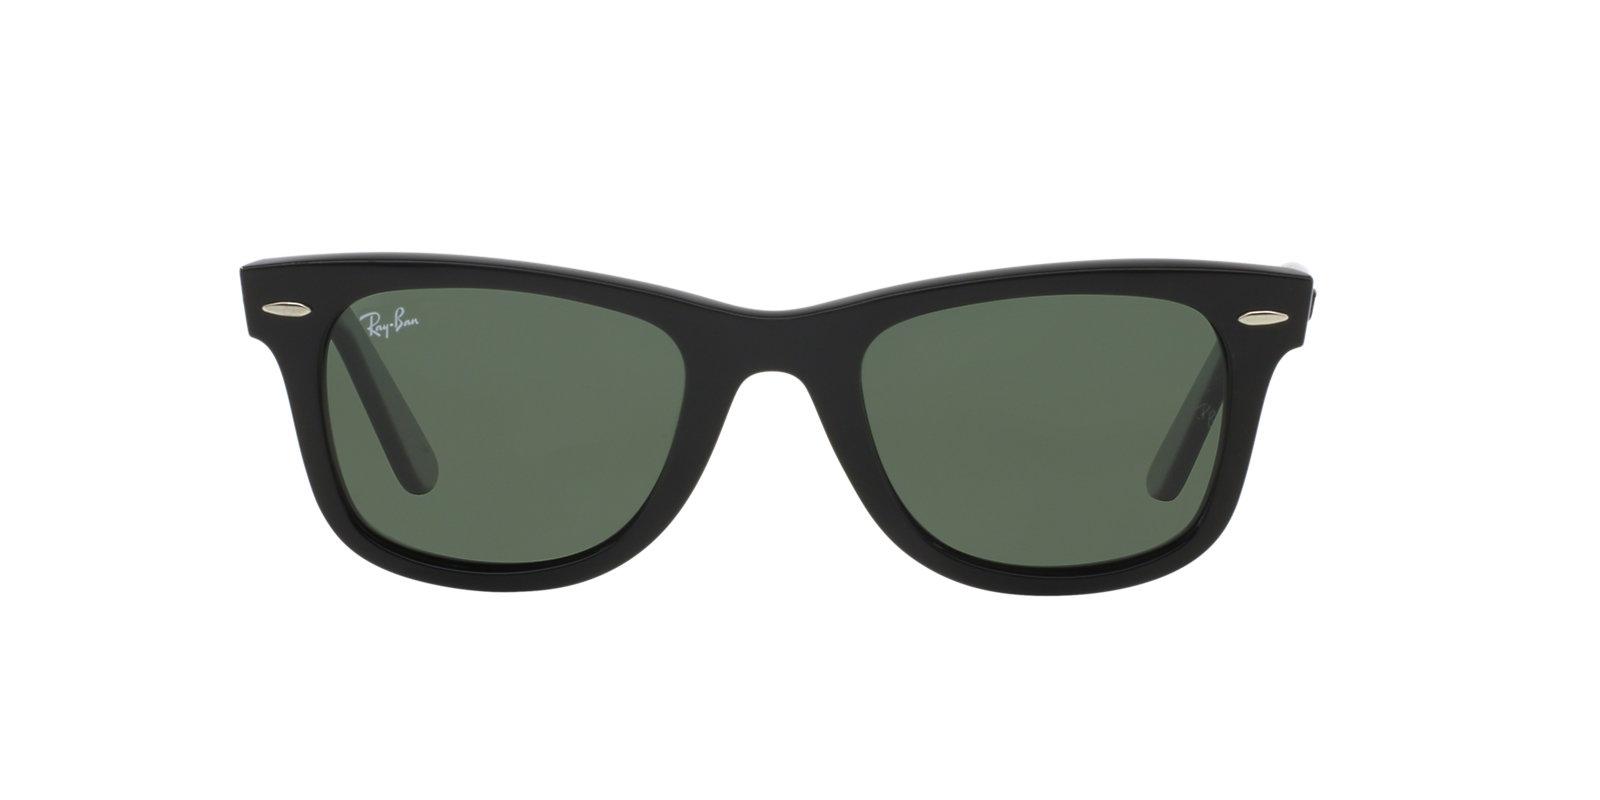 Check out Ray-Ban RB2140 54 ORIGINAL WAYFARER sunglasses from Sunglass Hut http://www.sunglasshut.com/us/805289126584